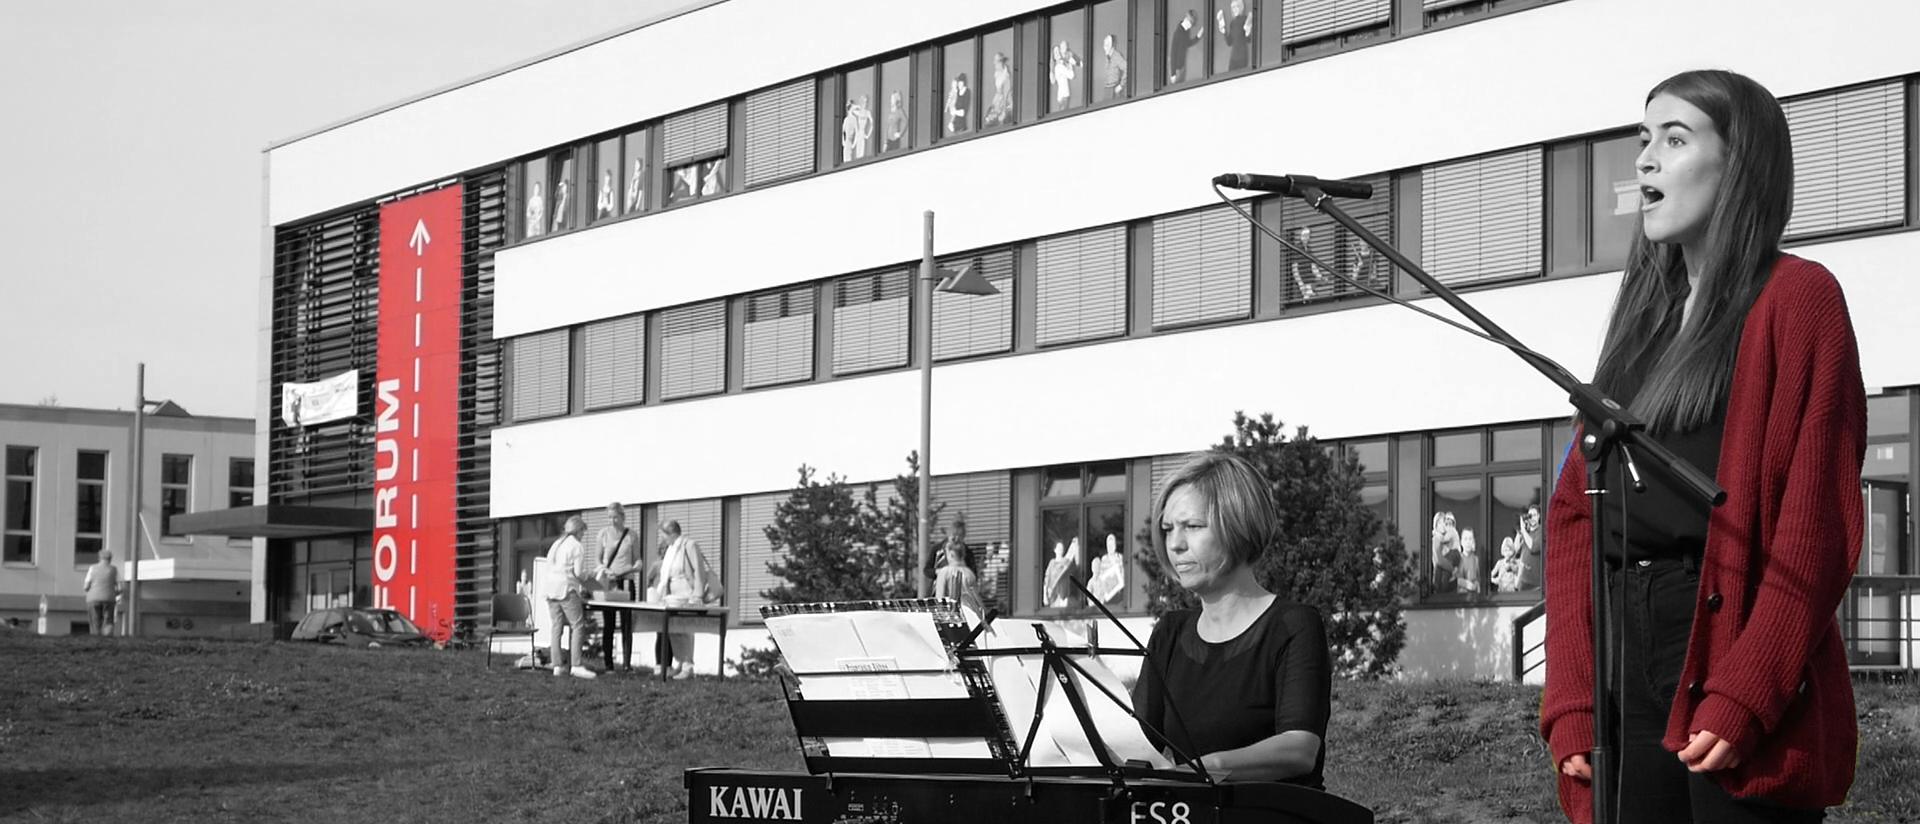 Musikschule Hoyerswerda